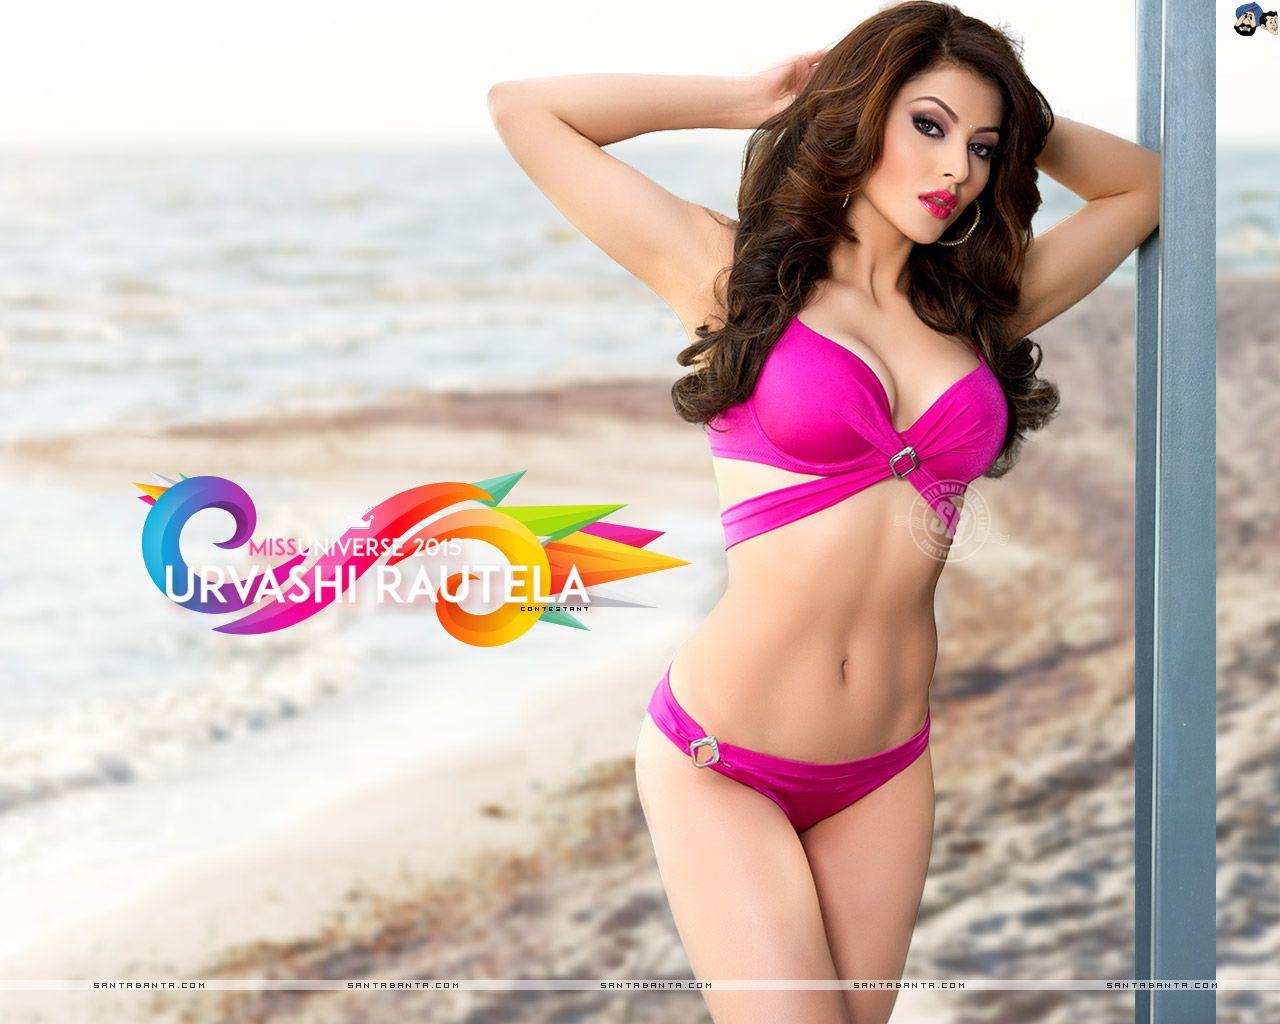 2019 Hd Wallpaper Bollywood Actress In Bikini: Urvashi Rautela HD Wallpapers